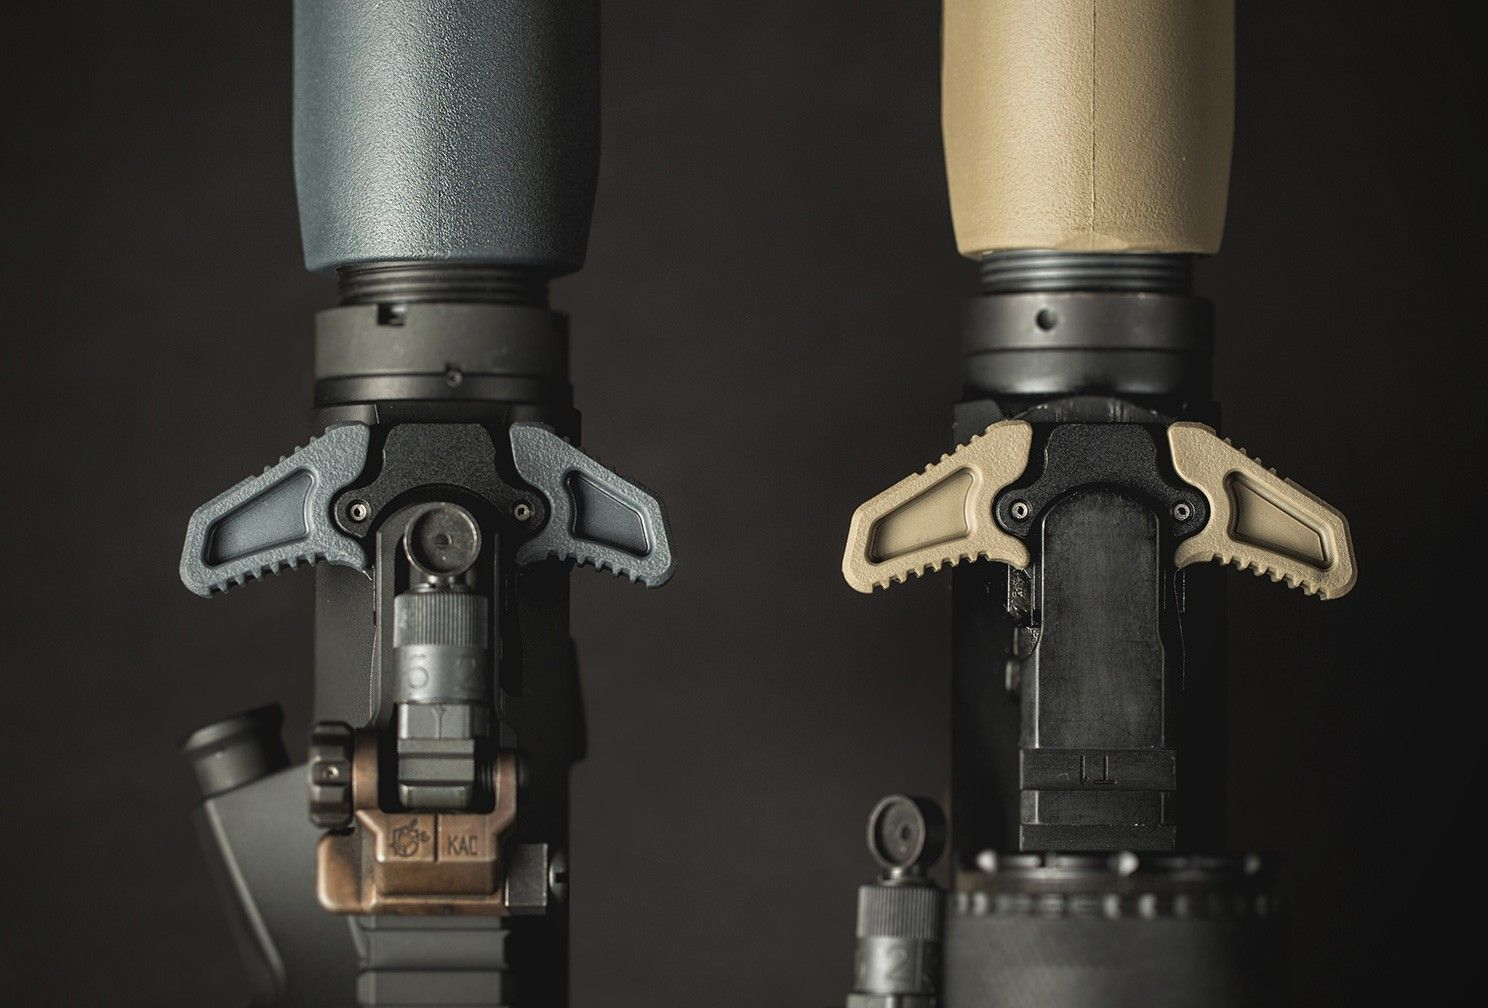 Radian Weapons Raptor-LT Ambidextrous Charging Handle